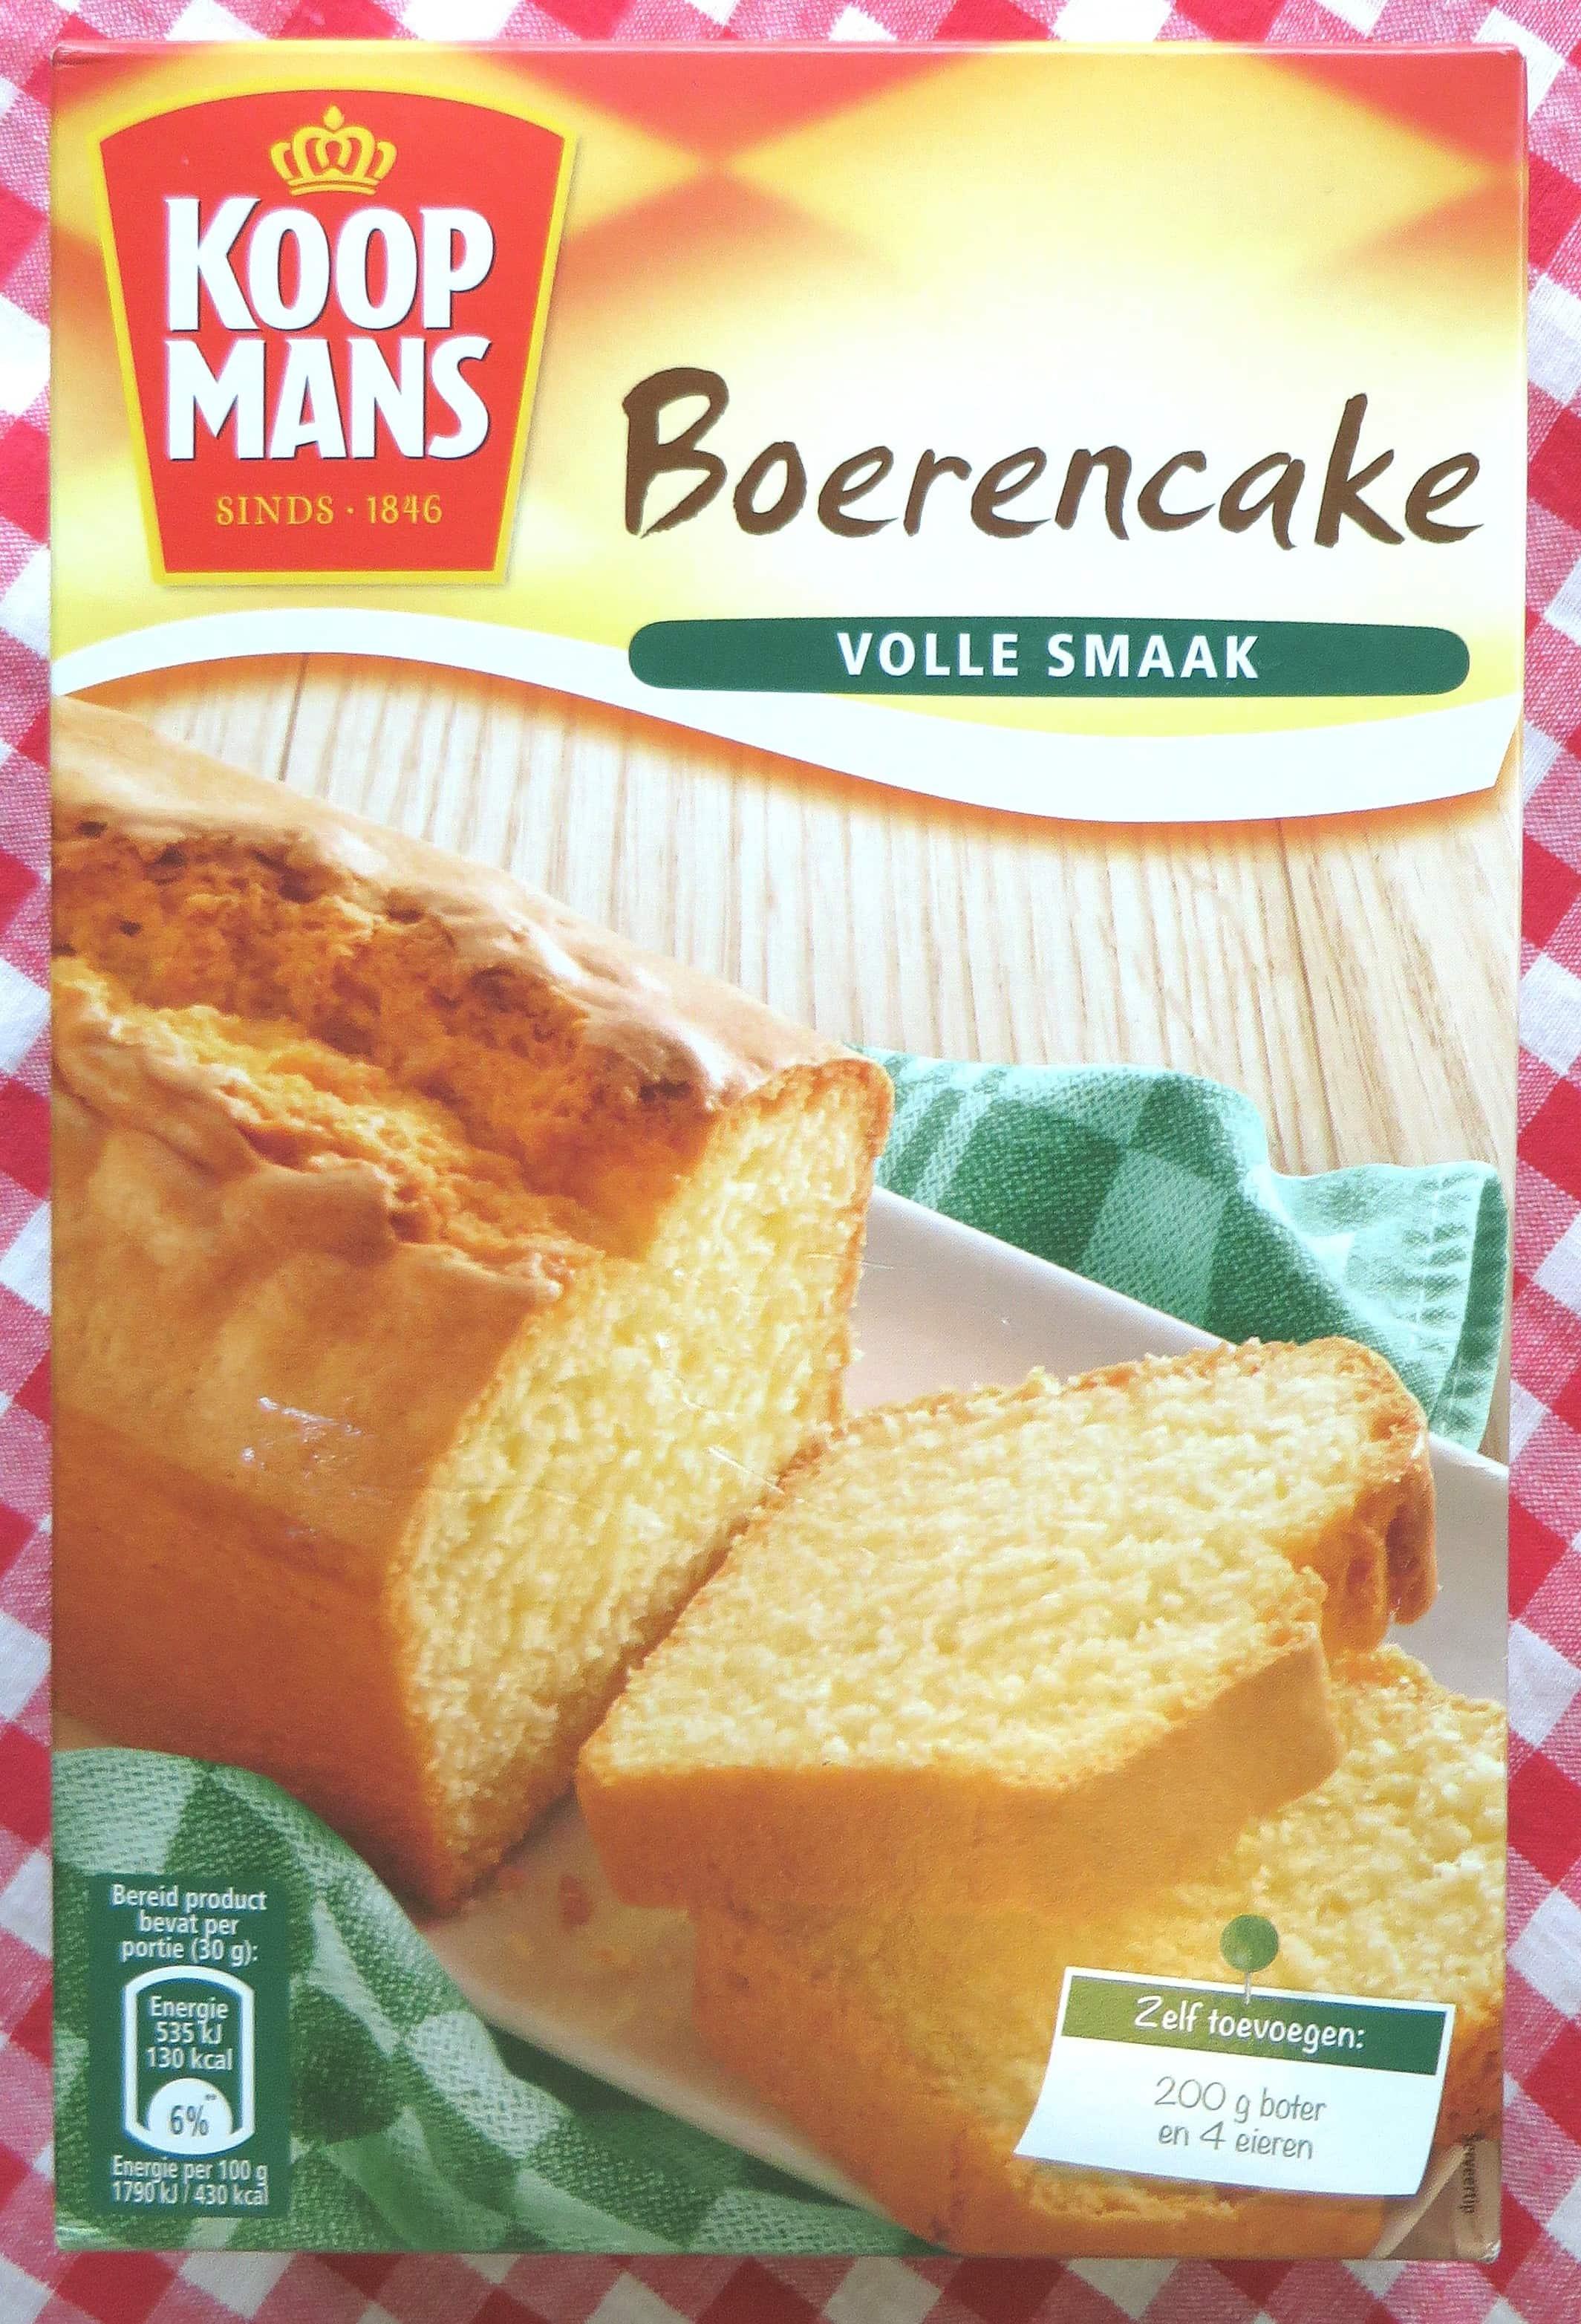 koopmans boerencake recept